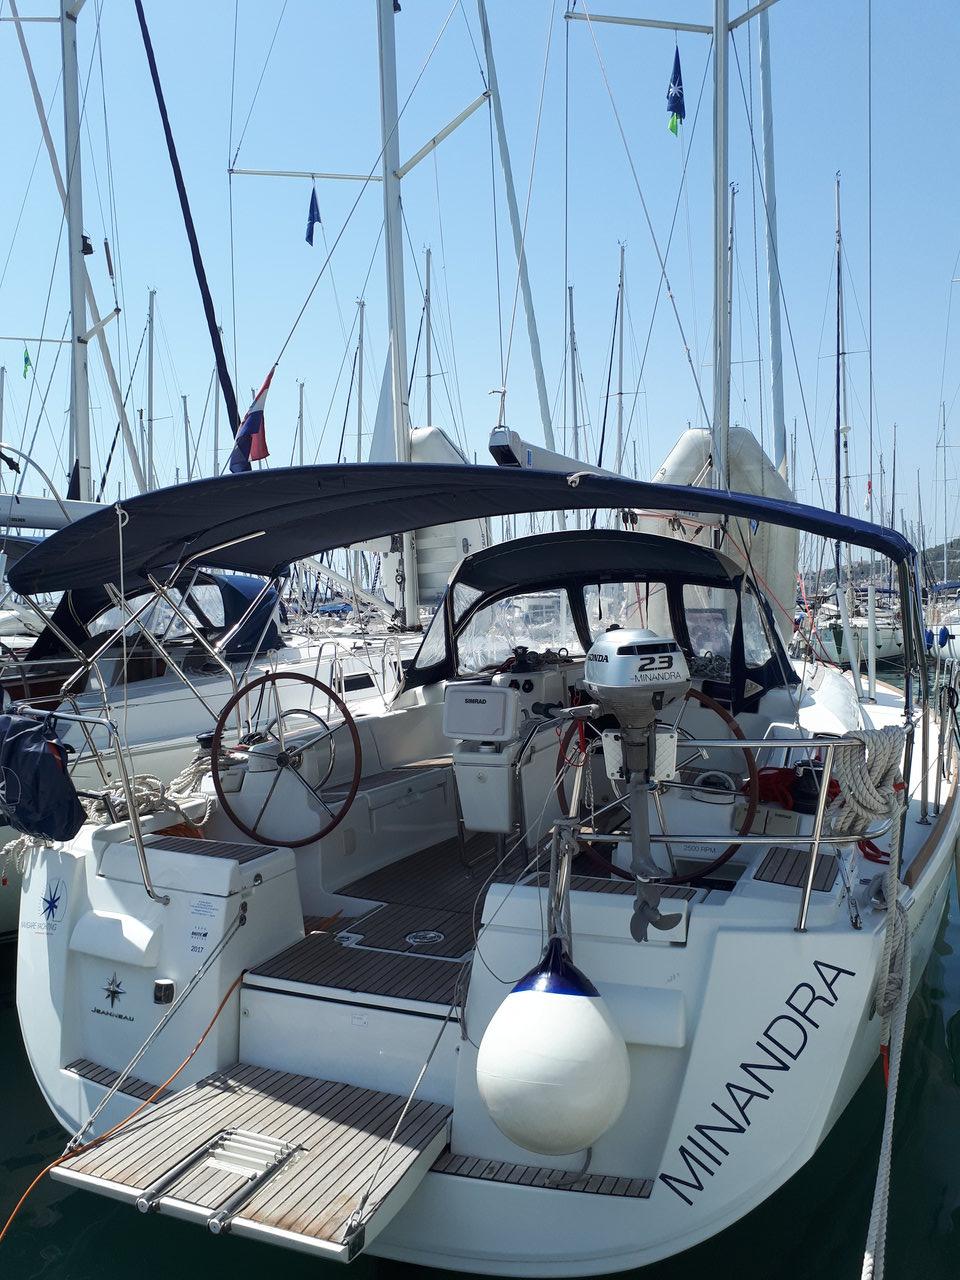 Sun Odyssey 439, Minandra